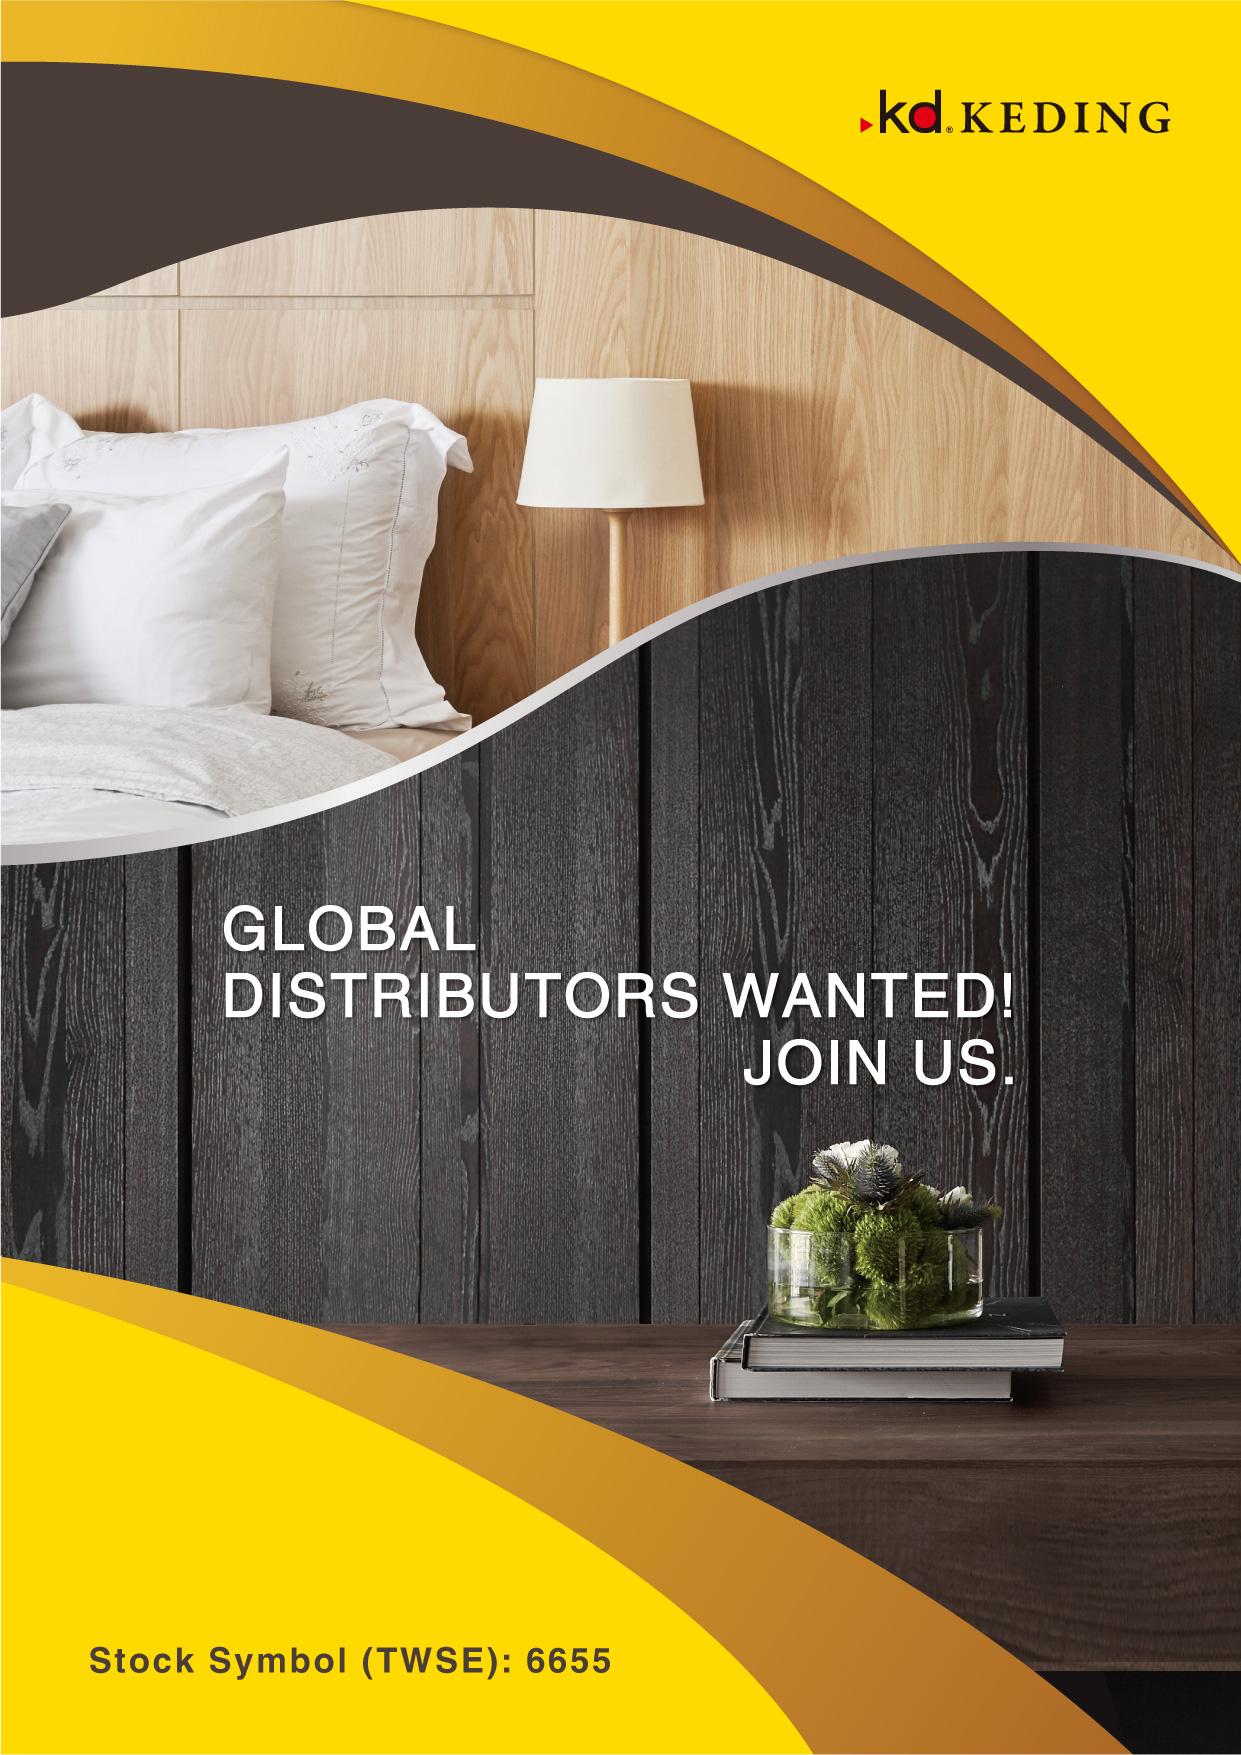 GLOBAL DISTRIBUTORS WANTED